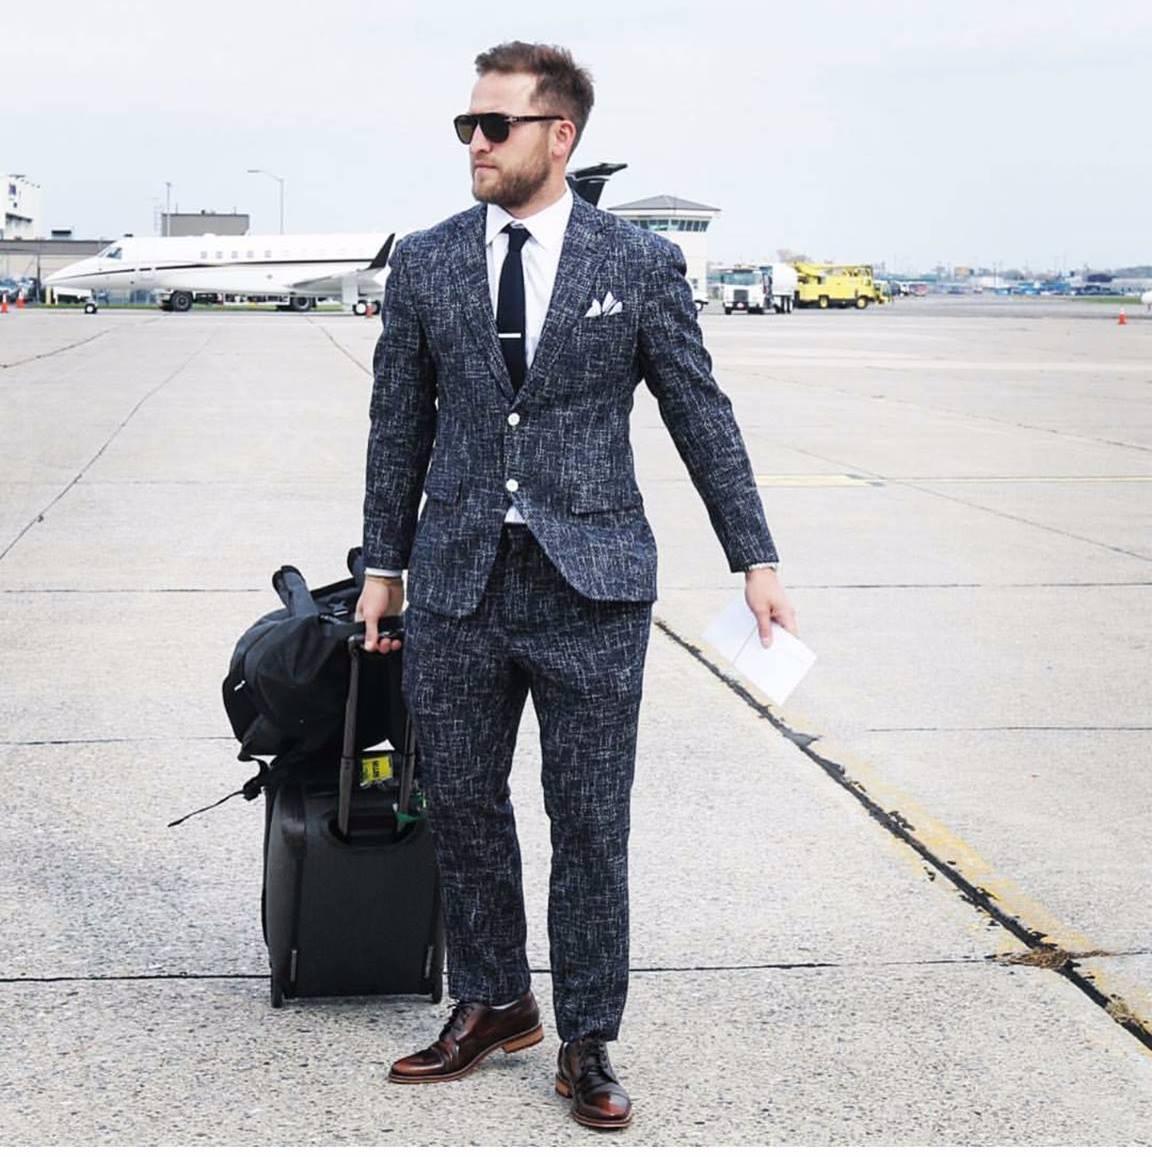 Sam Martin Traveling